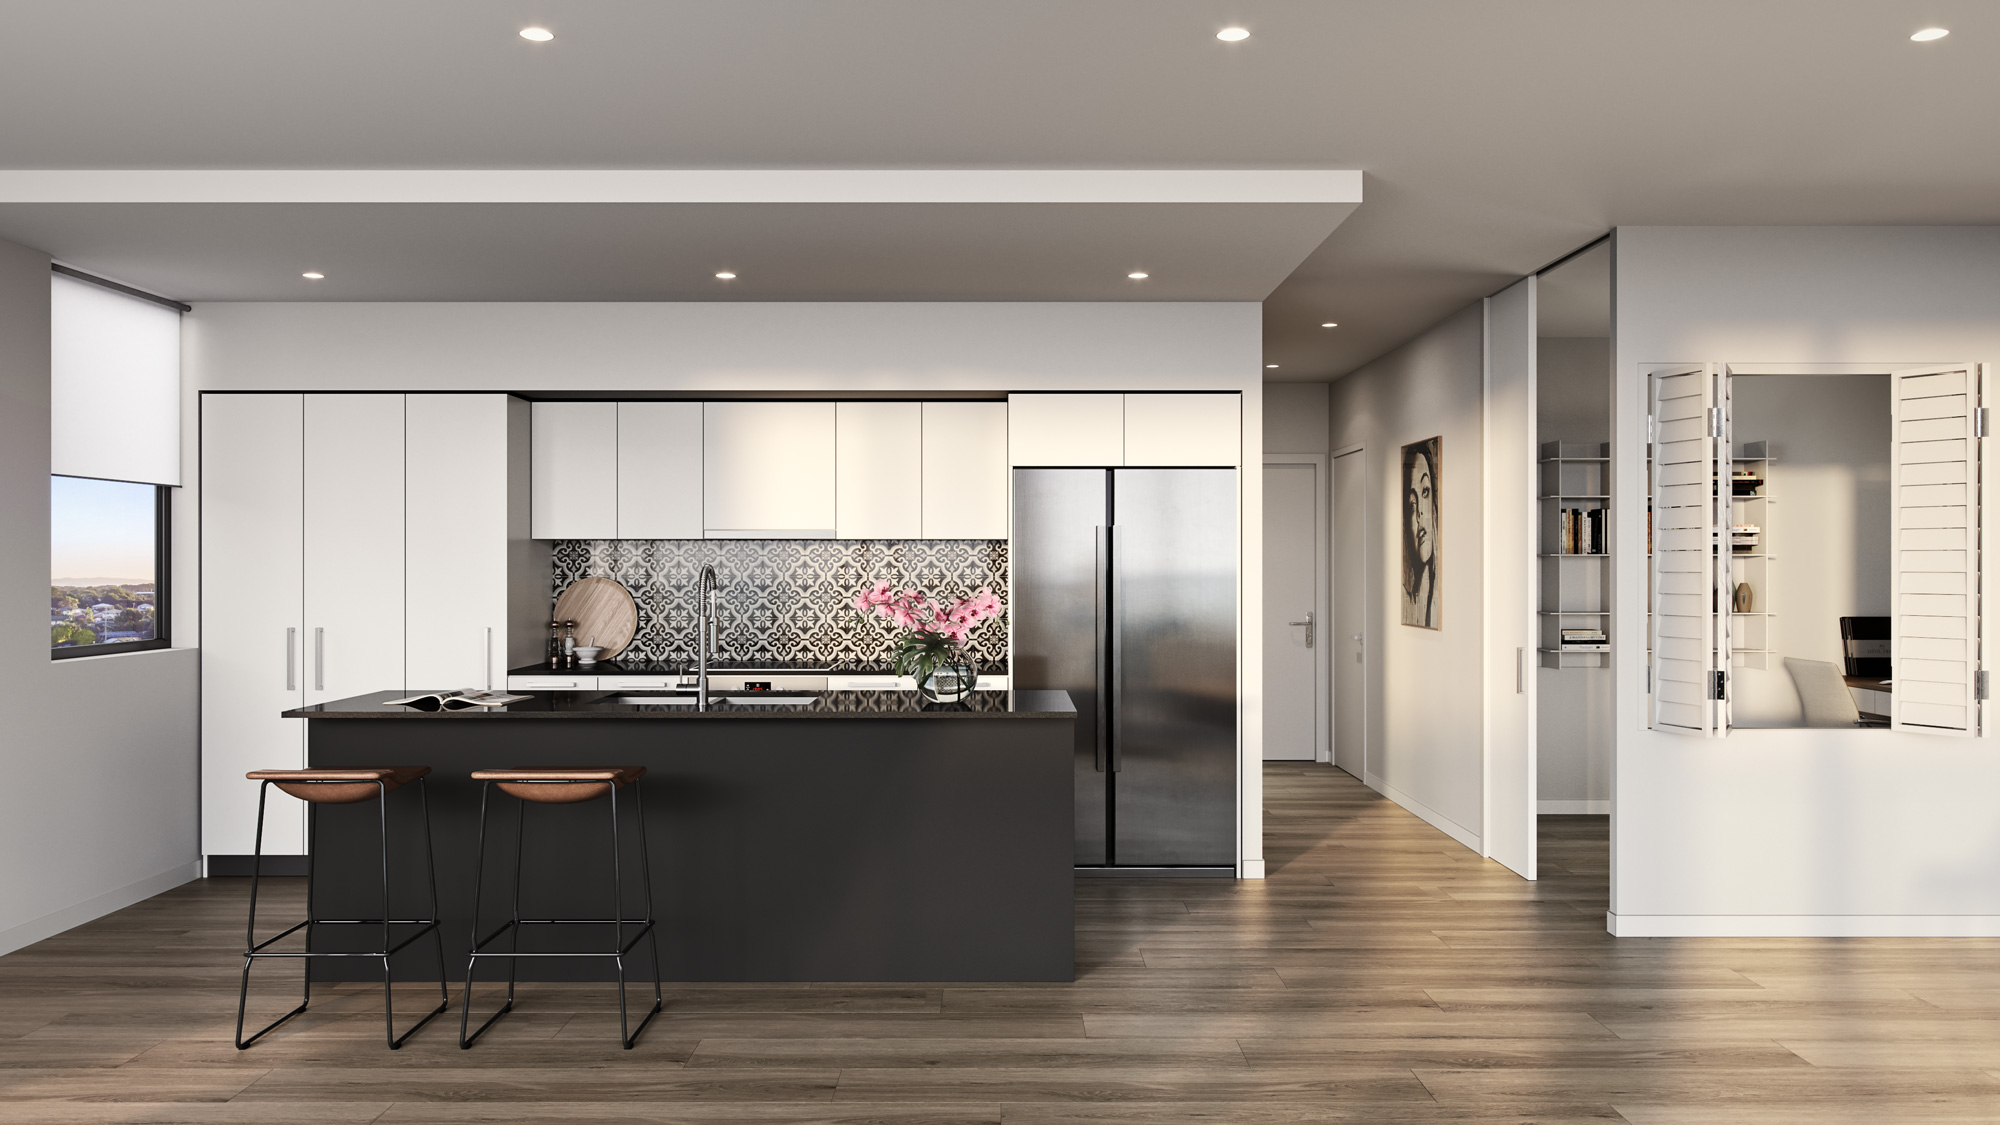 Kitchen_Study_The_Huxley_5_Chirn_Cresent_Labrador_Chirn_Park.jpg